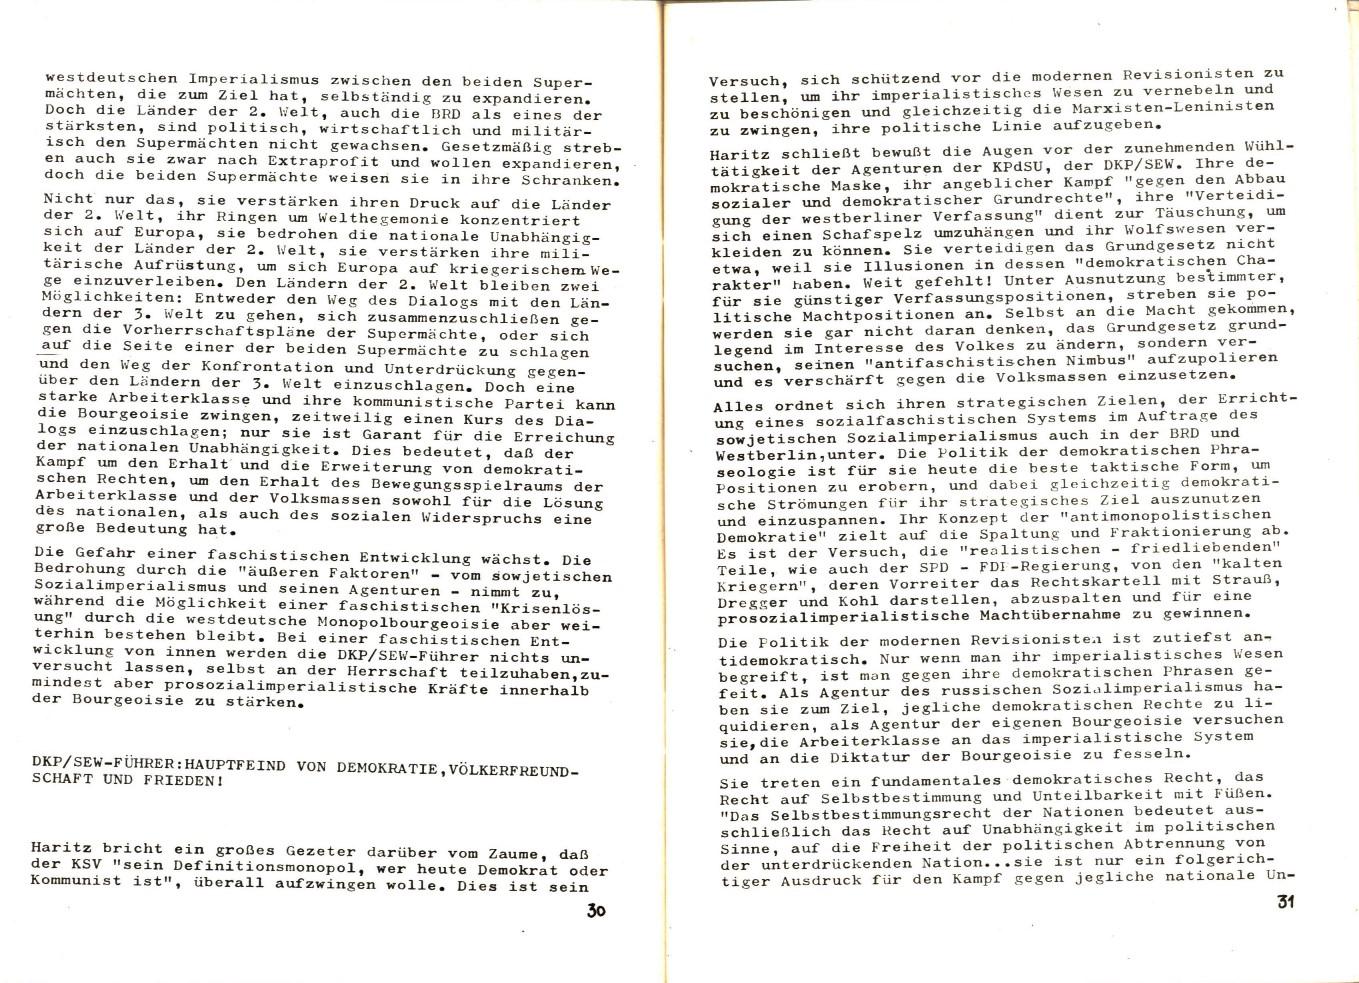 Berlin_KSV_1975_Dokumente_der_SAZ_17